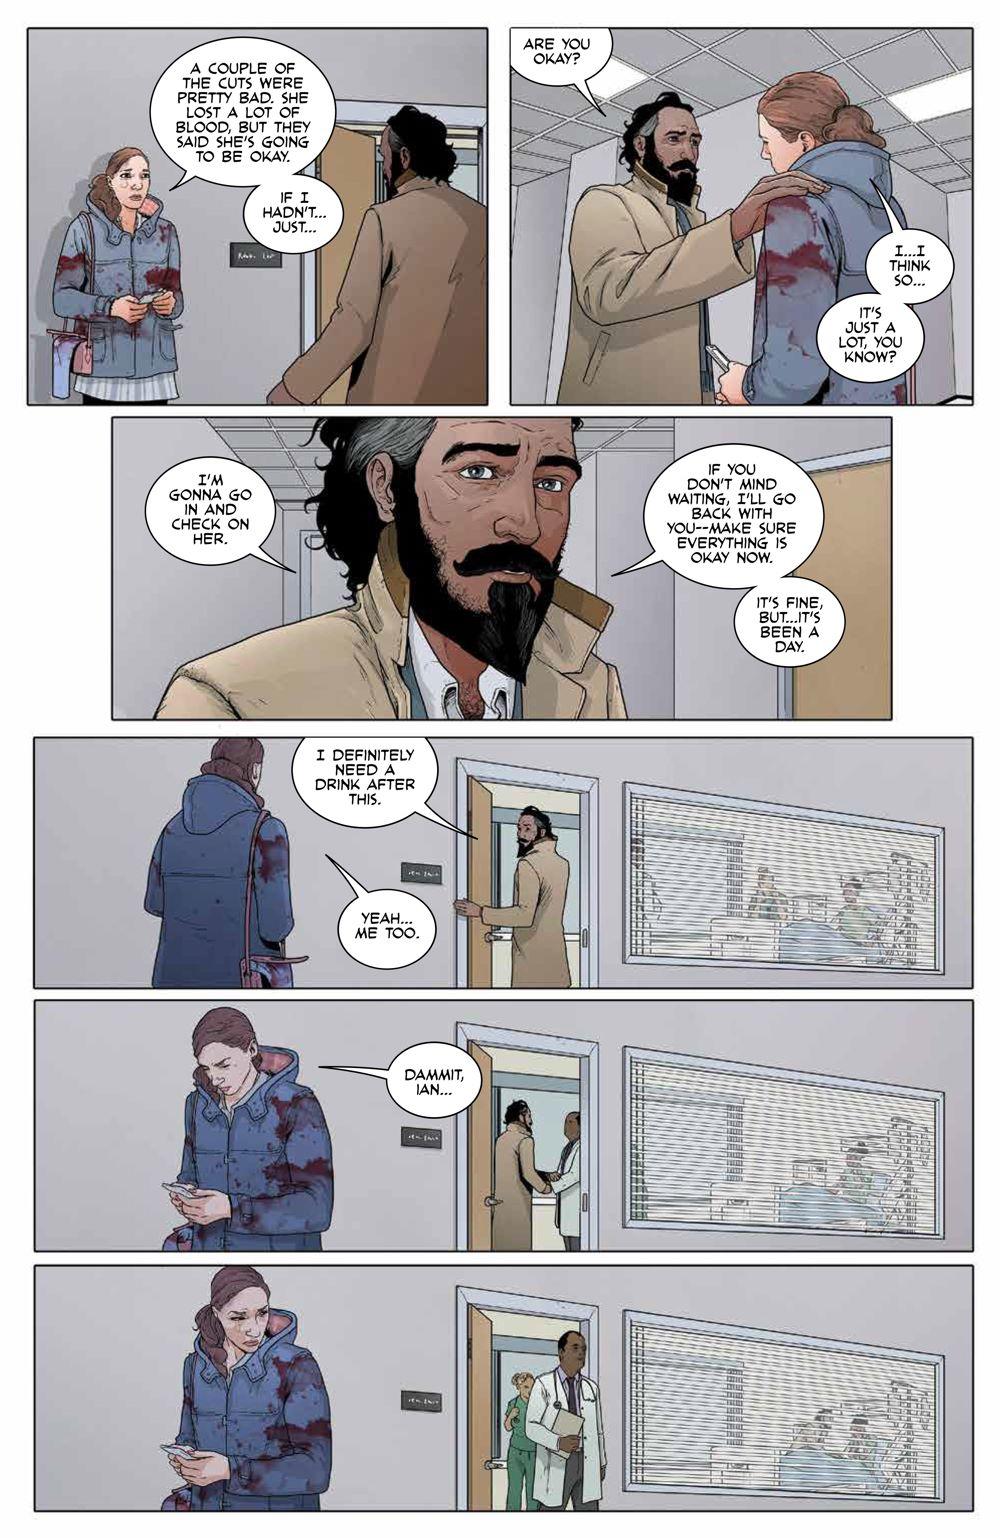 RedMother_v3_SC_PRESS_17 ComicList Previews: RED MOTHER VOLUME 3 TP